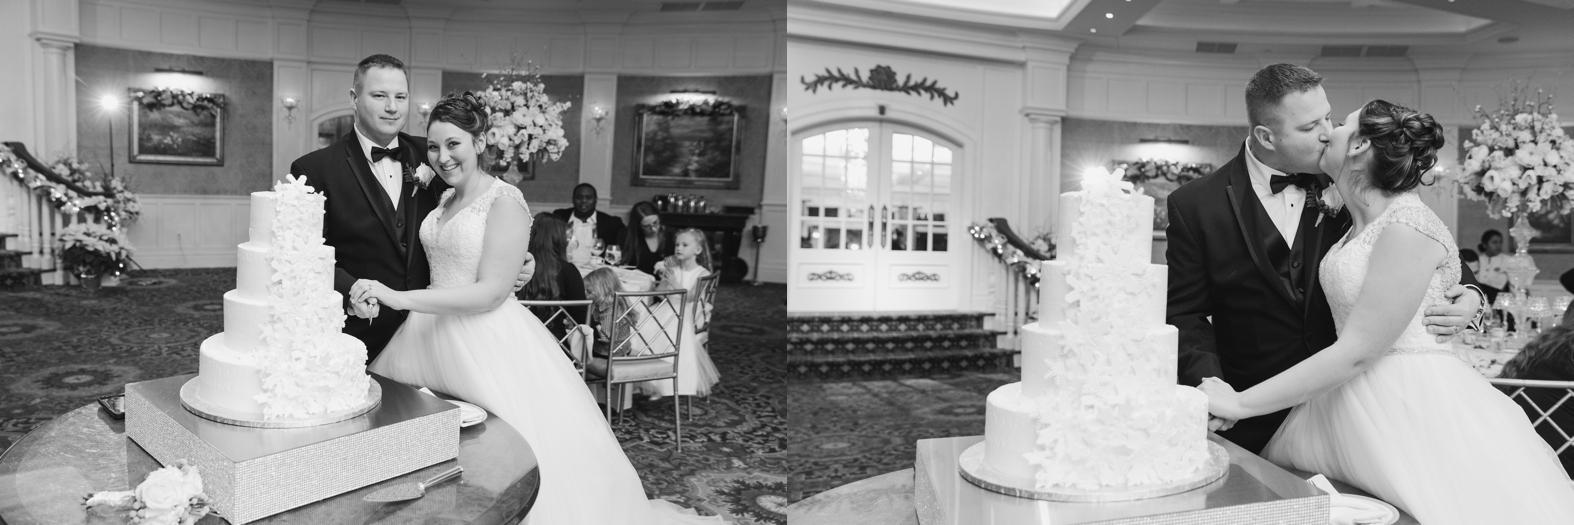 NJ Wedding Photography_0891.jpg